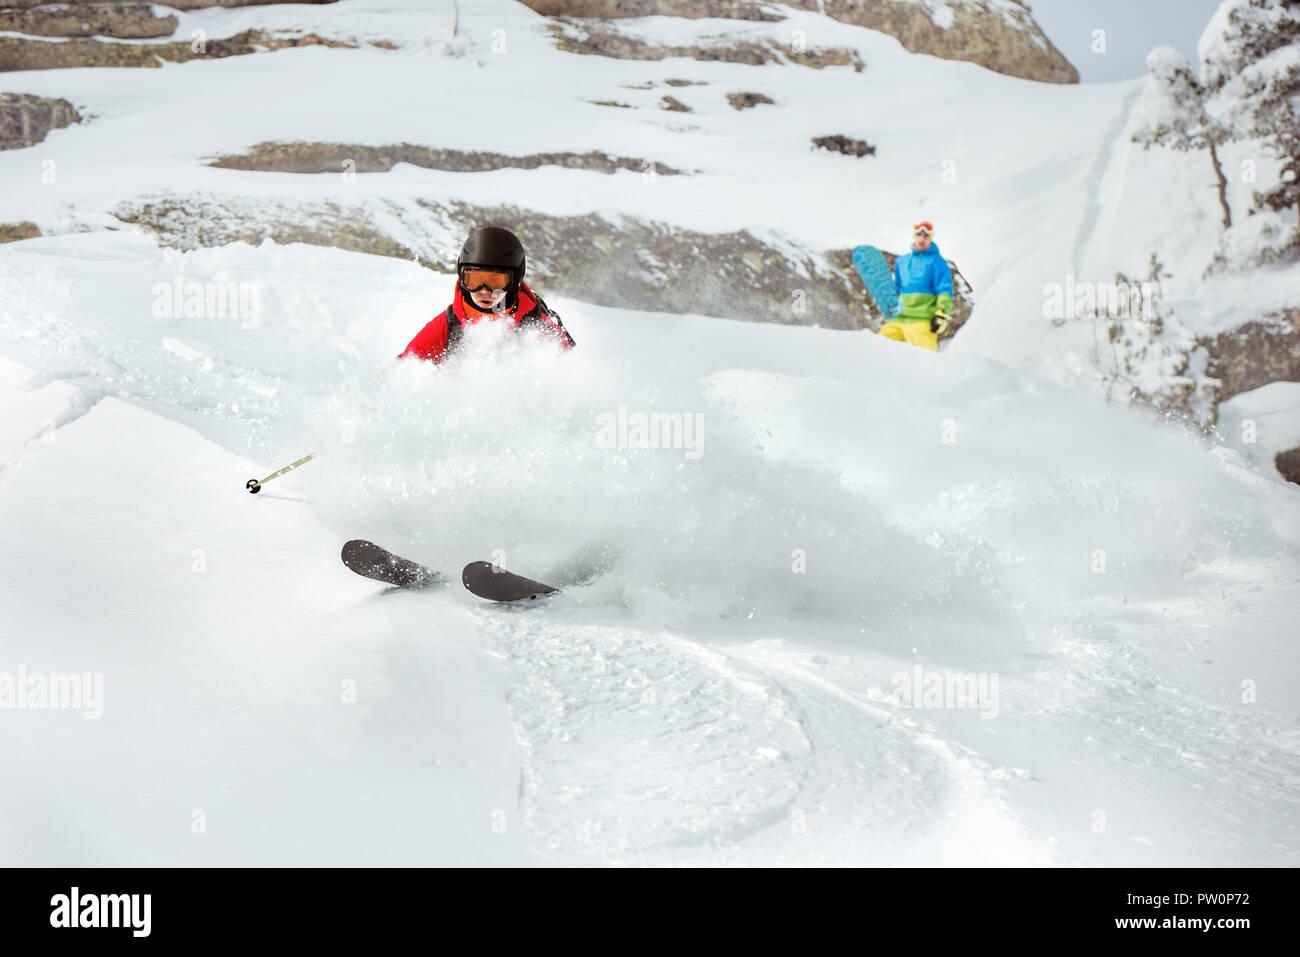 Skier freerides at offpiste slope against snowboarder and cliff. Ski resort concept - Stock Image